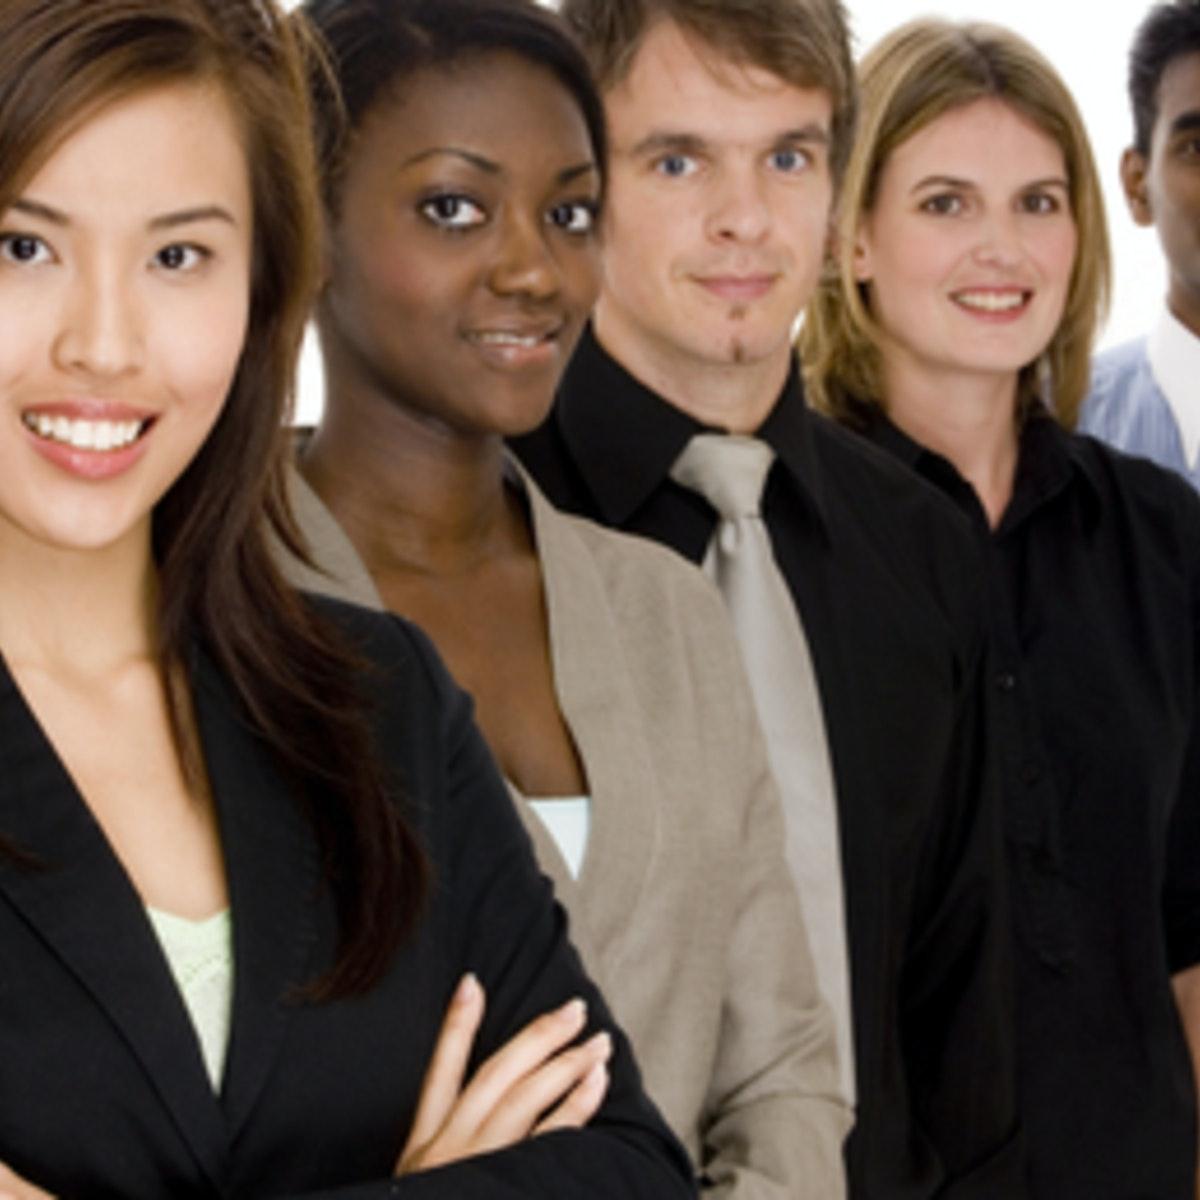 Women in Leadership: Inspiring Positive Change!